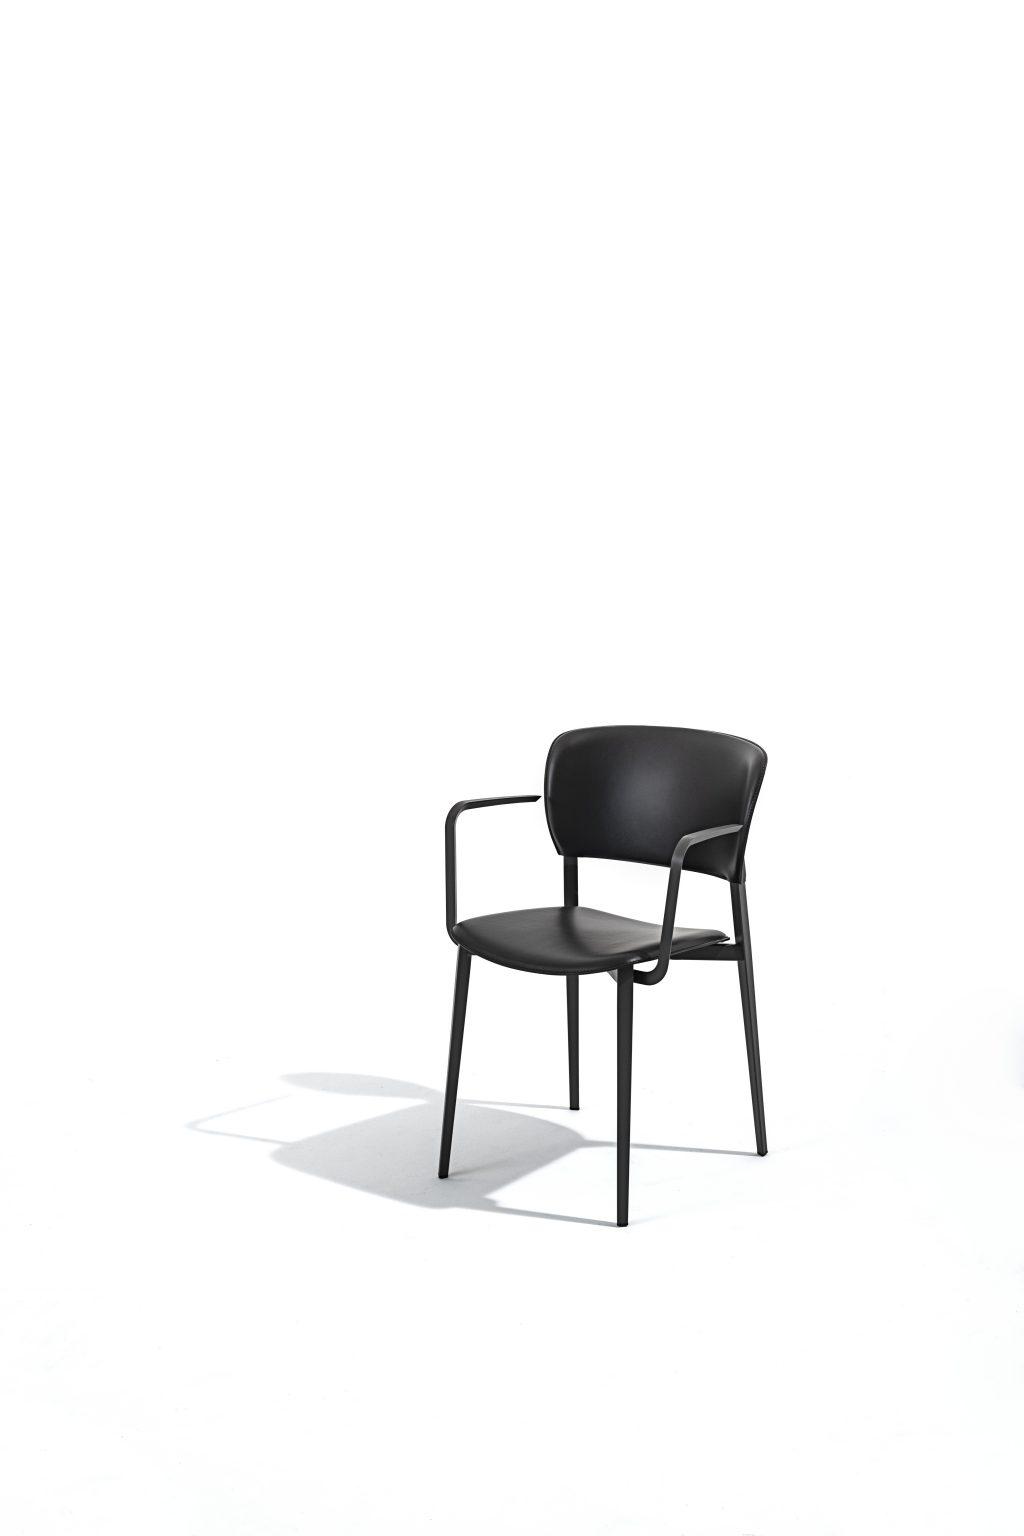 Biennale Interieur - Belgium's leading design and interior event - Ply-1-1.jpg